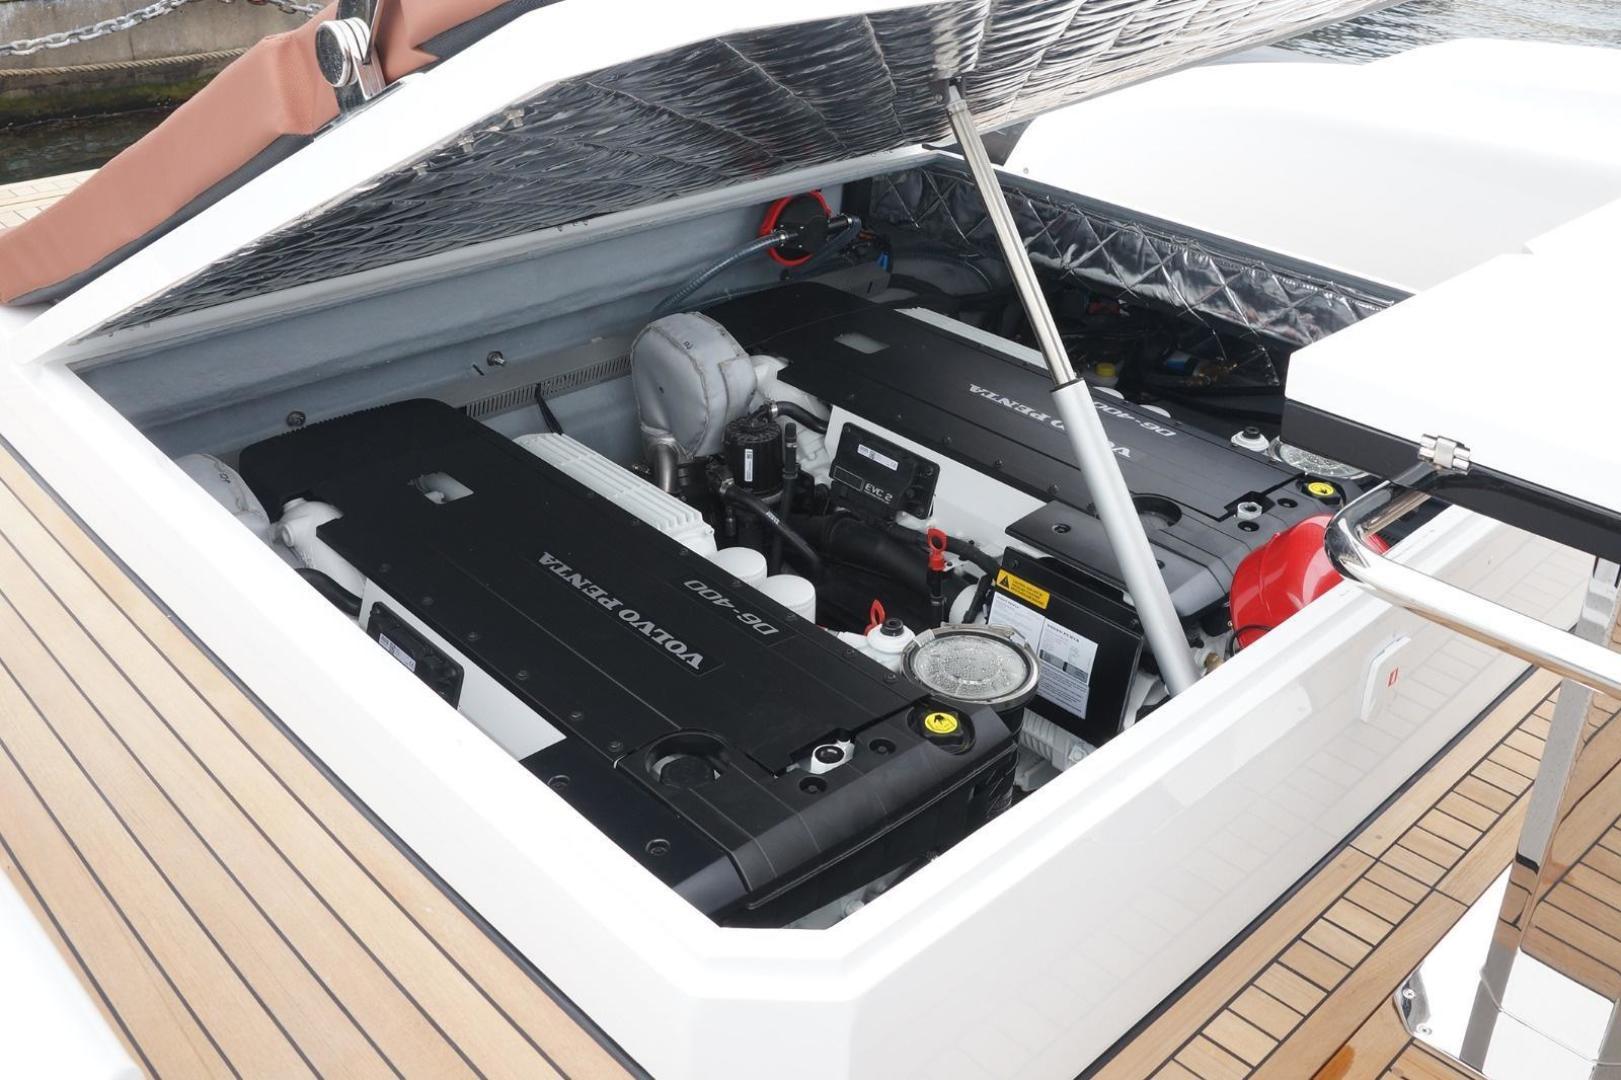 Pirelli-PZero 1250 2020-Pzero 1250 Fort Lauderdale-Florida-United States-1549636   Thumbnail